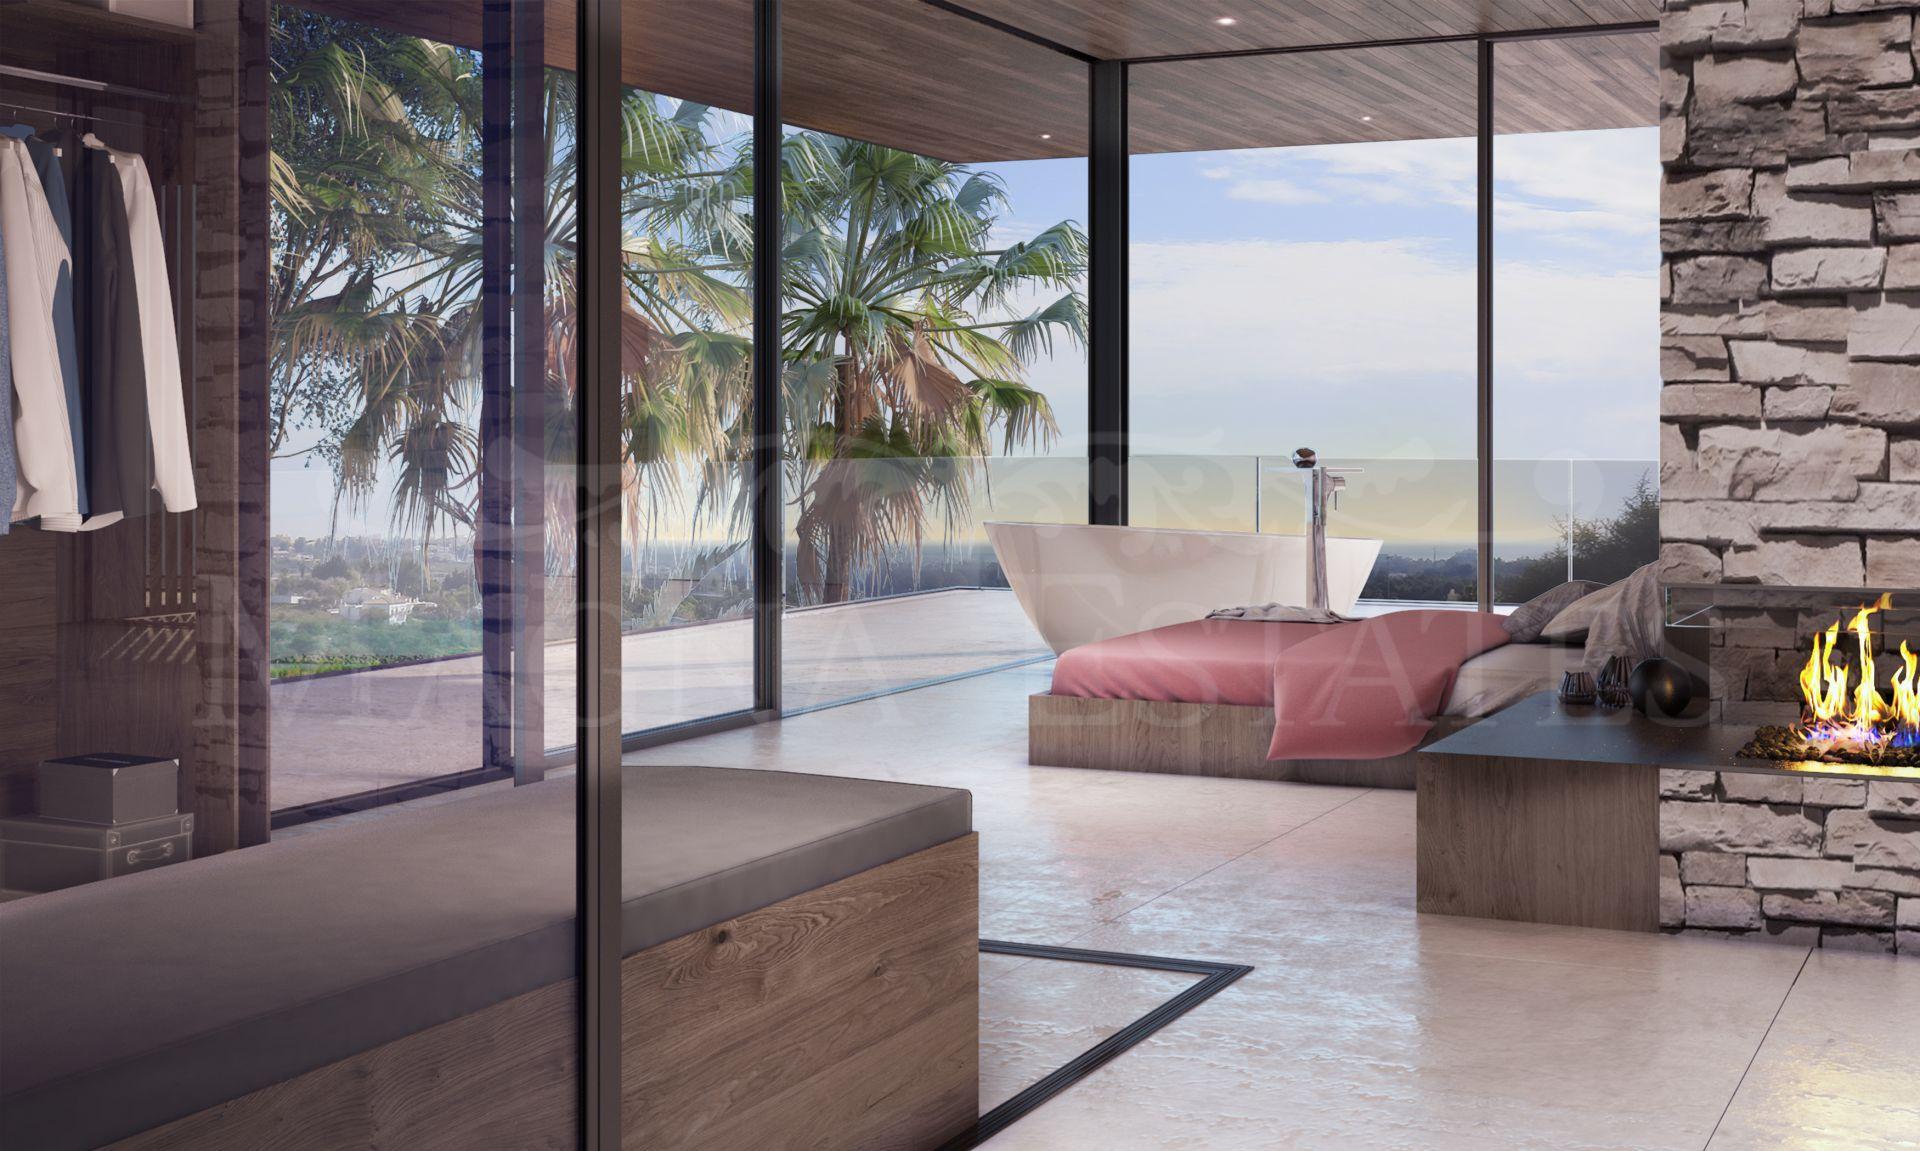 Contemporary design villa project in Puerto del Almendro, Benahavís